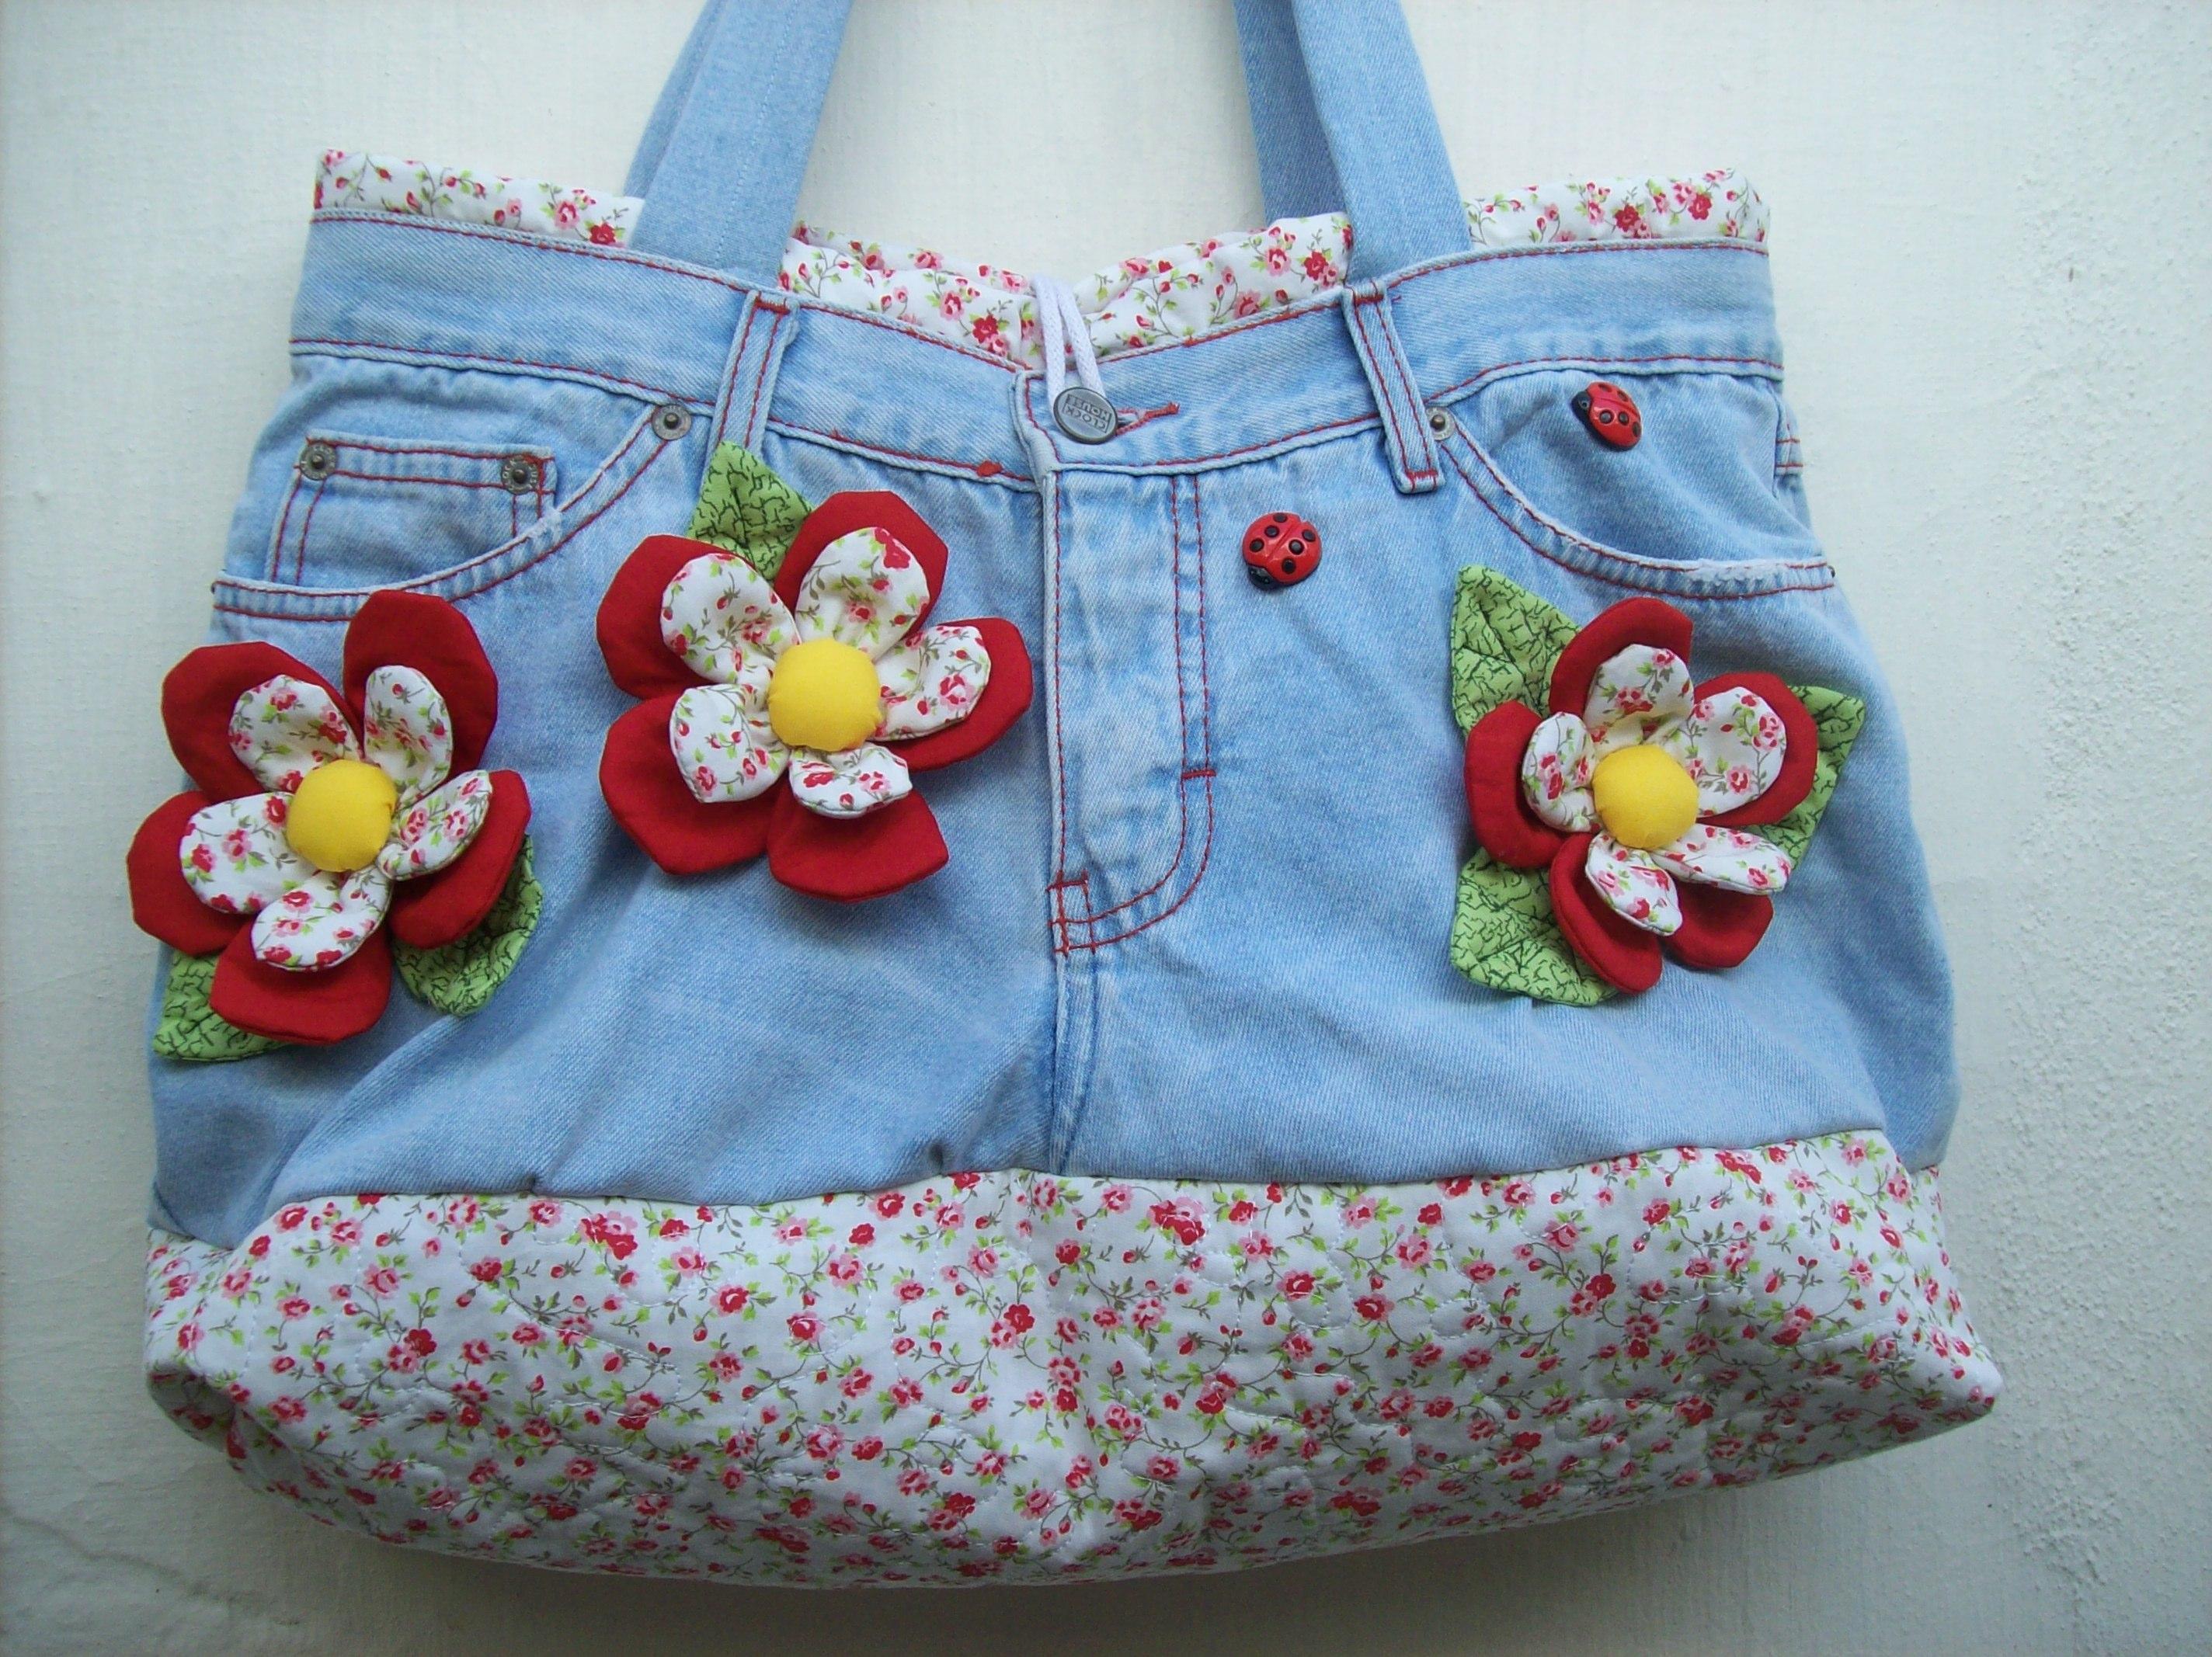 Bolsa De Tecido Artesanal : Bolsa jeans quot flowers dianne pedrosa elo